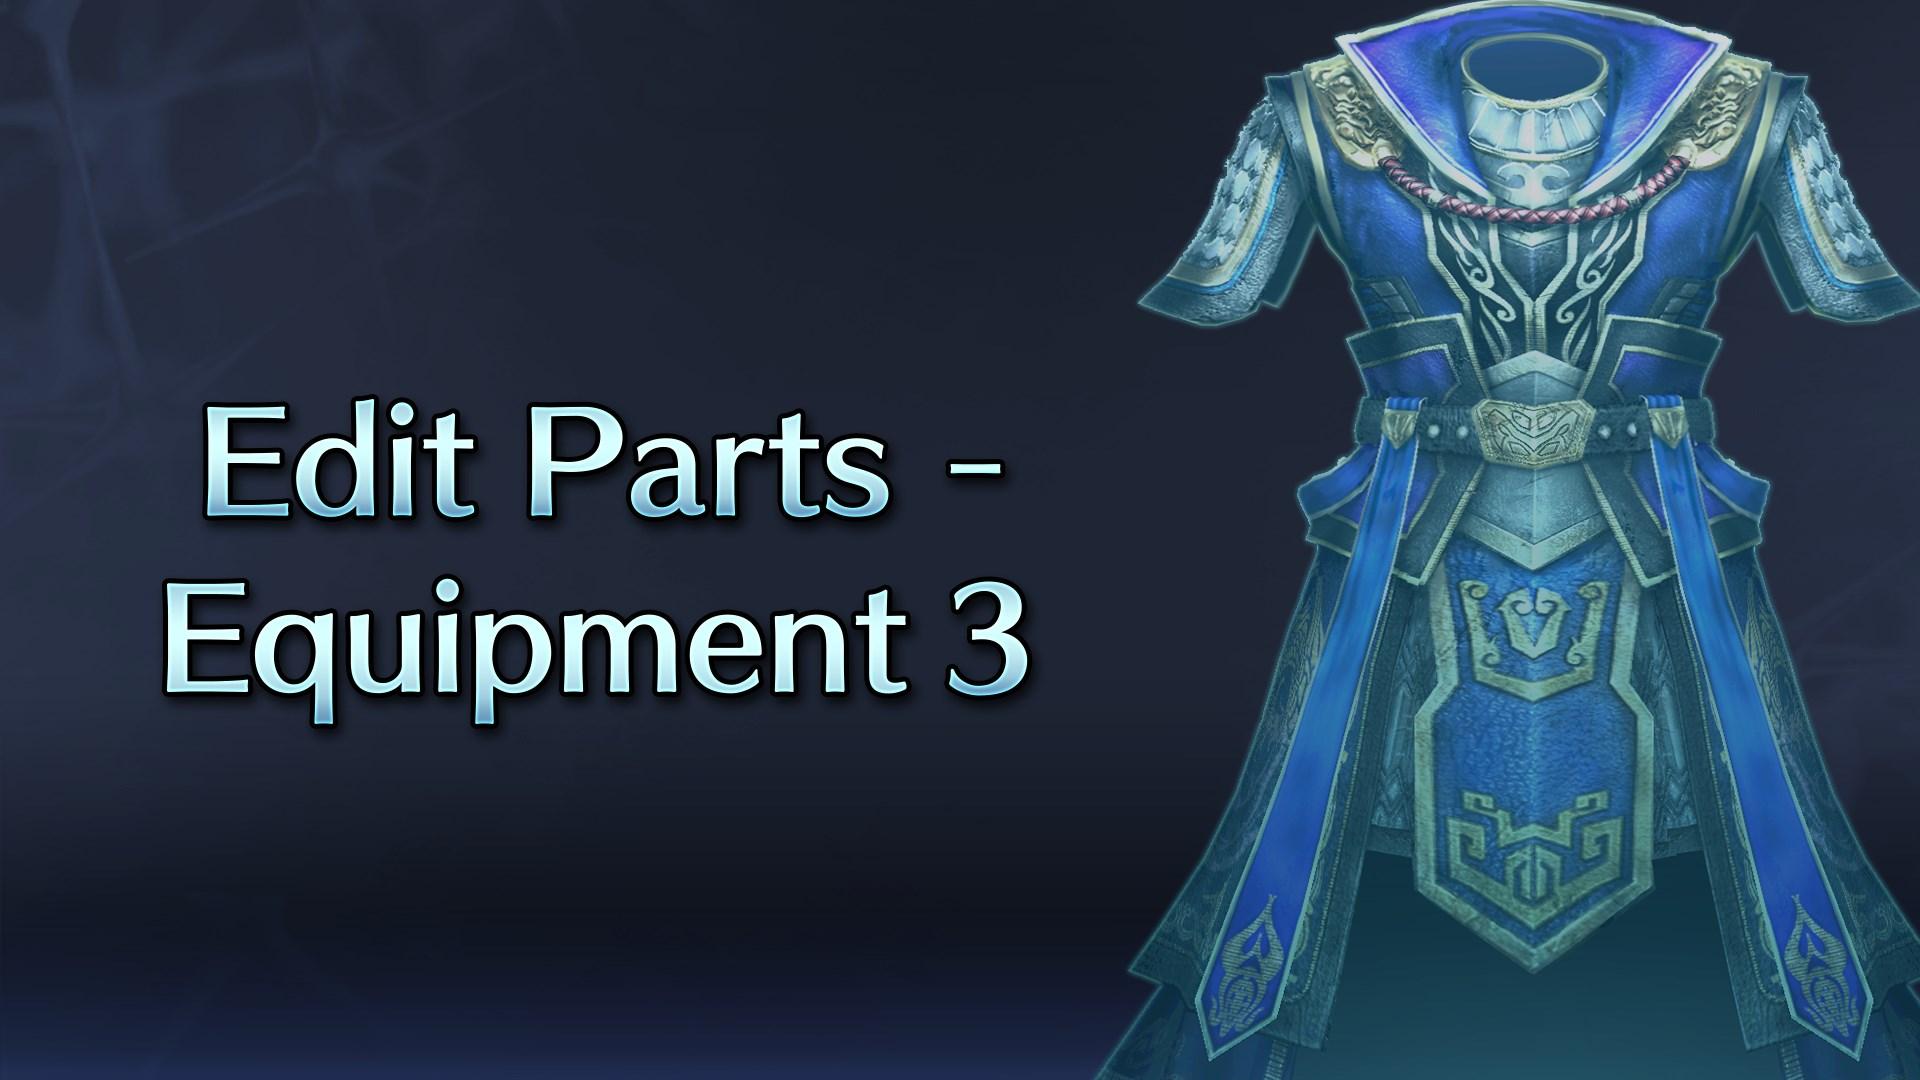 Edit Parts - Equipment 3